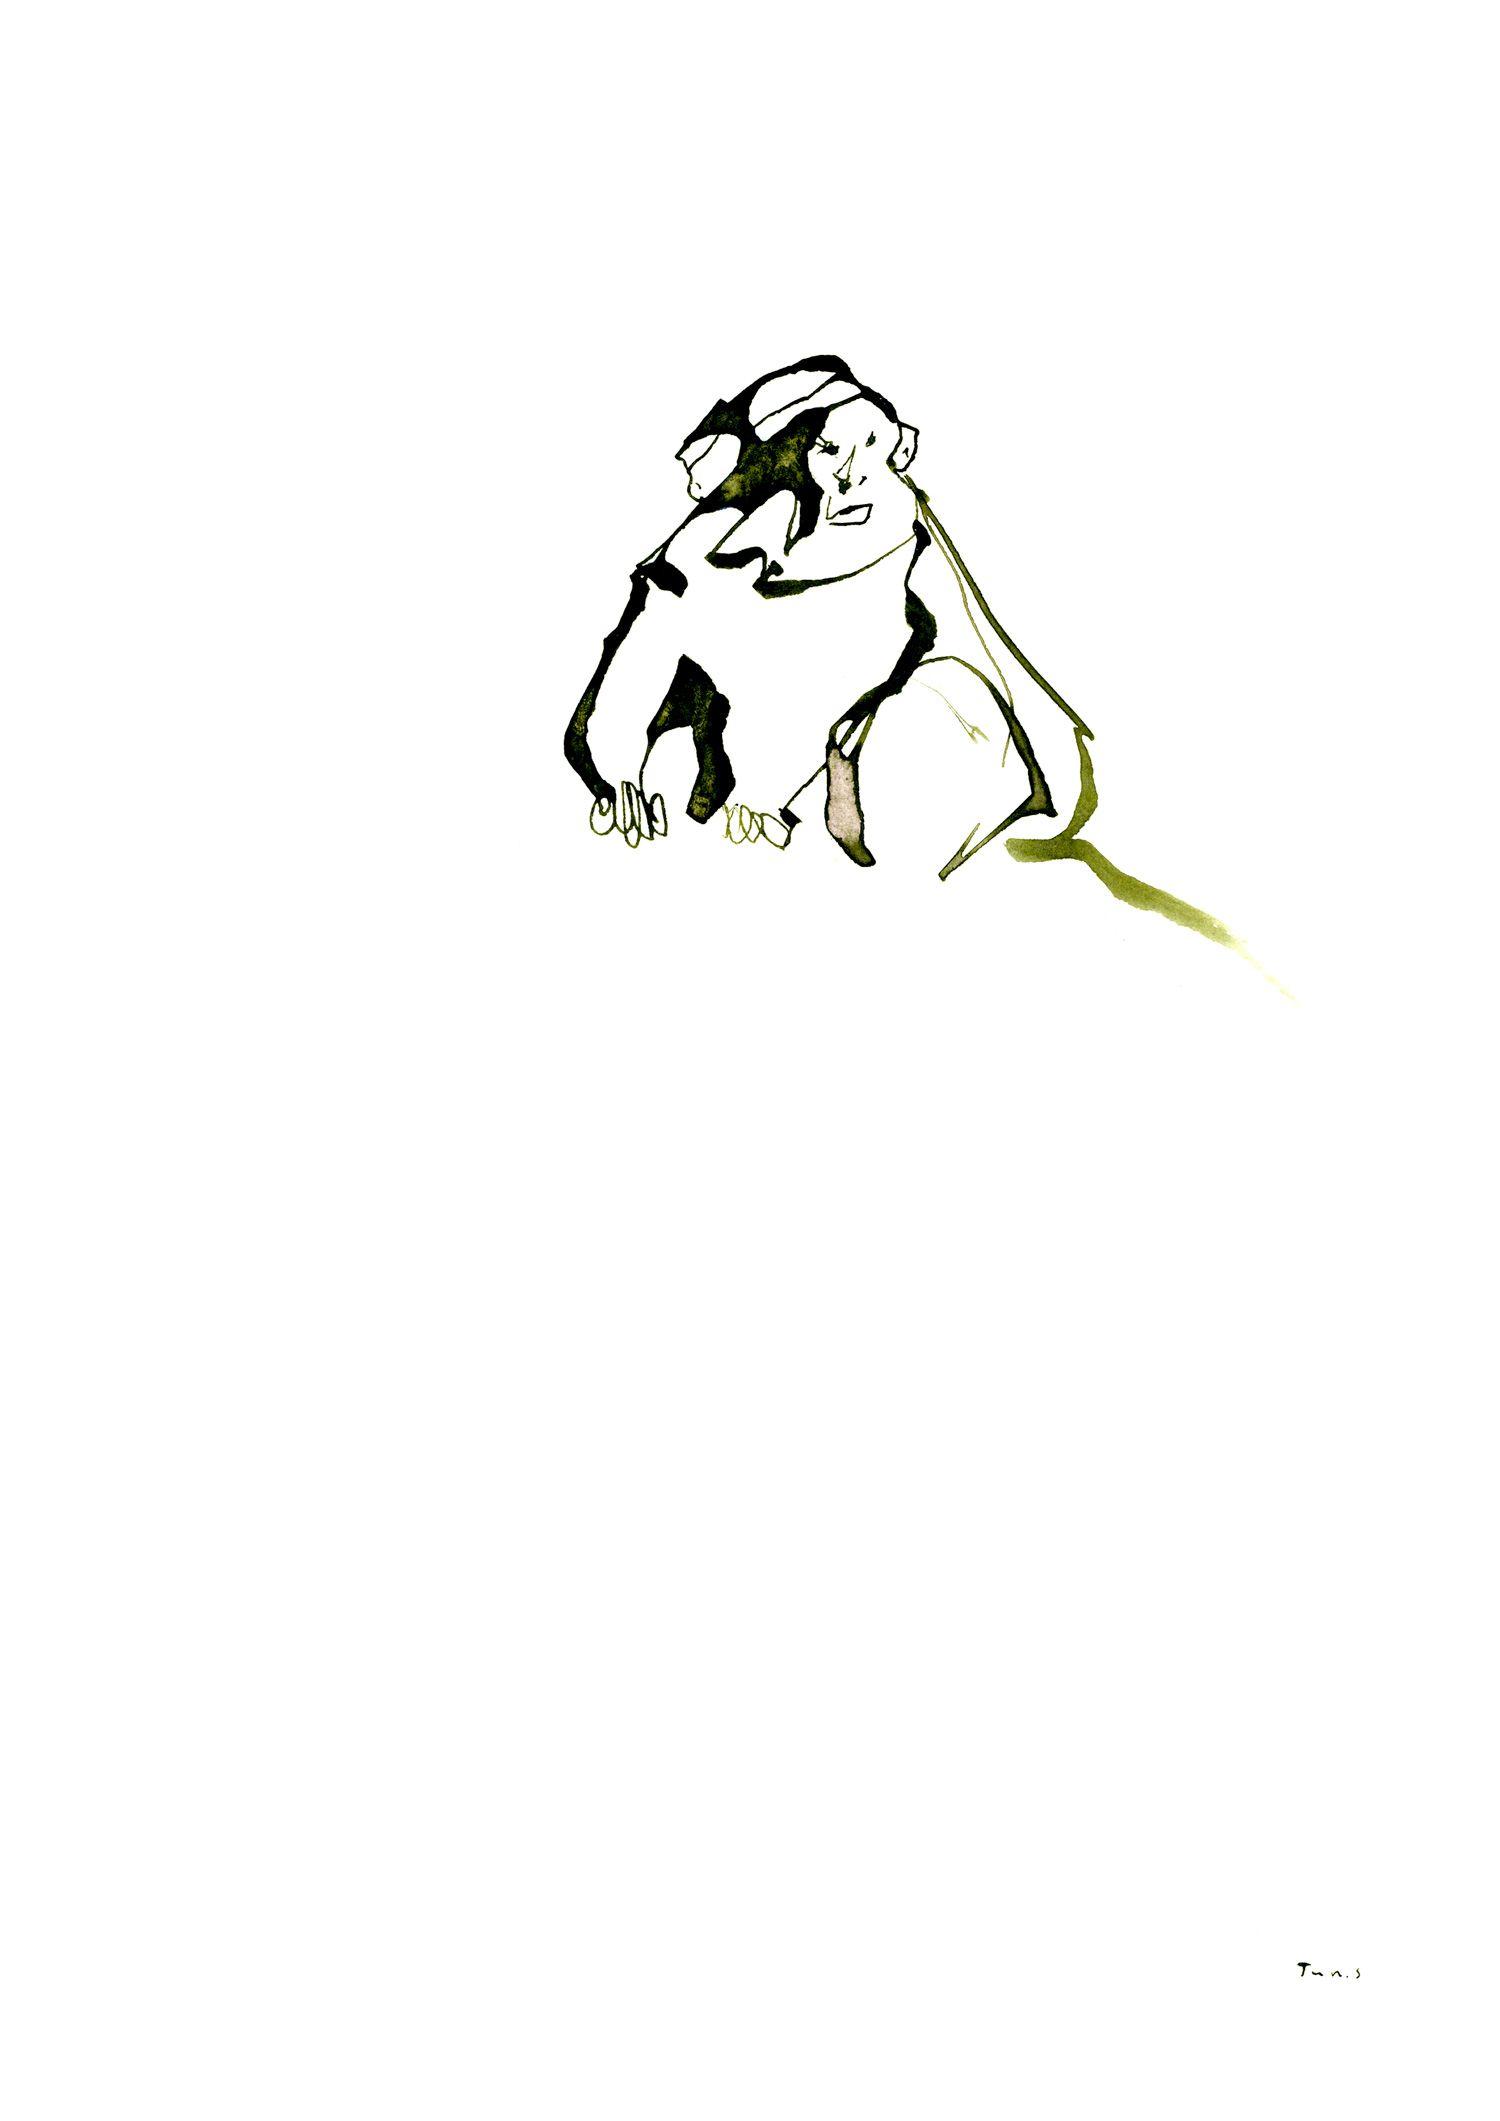 monkey 「golden monkey:rwanda」 pen,ink #イラスト #サル #アート